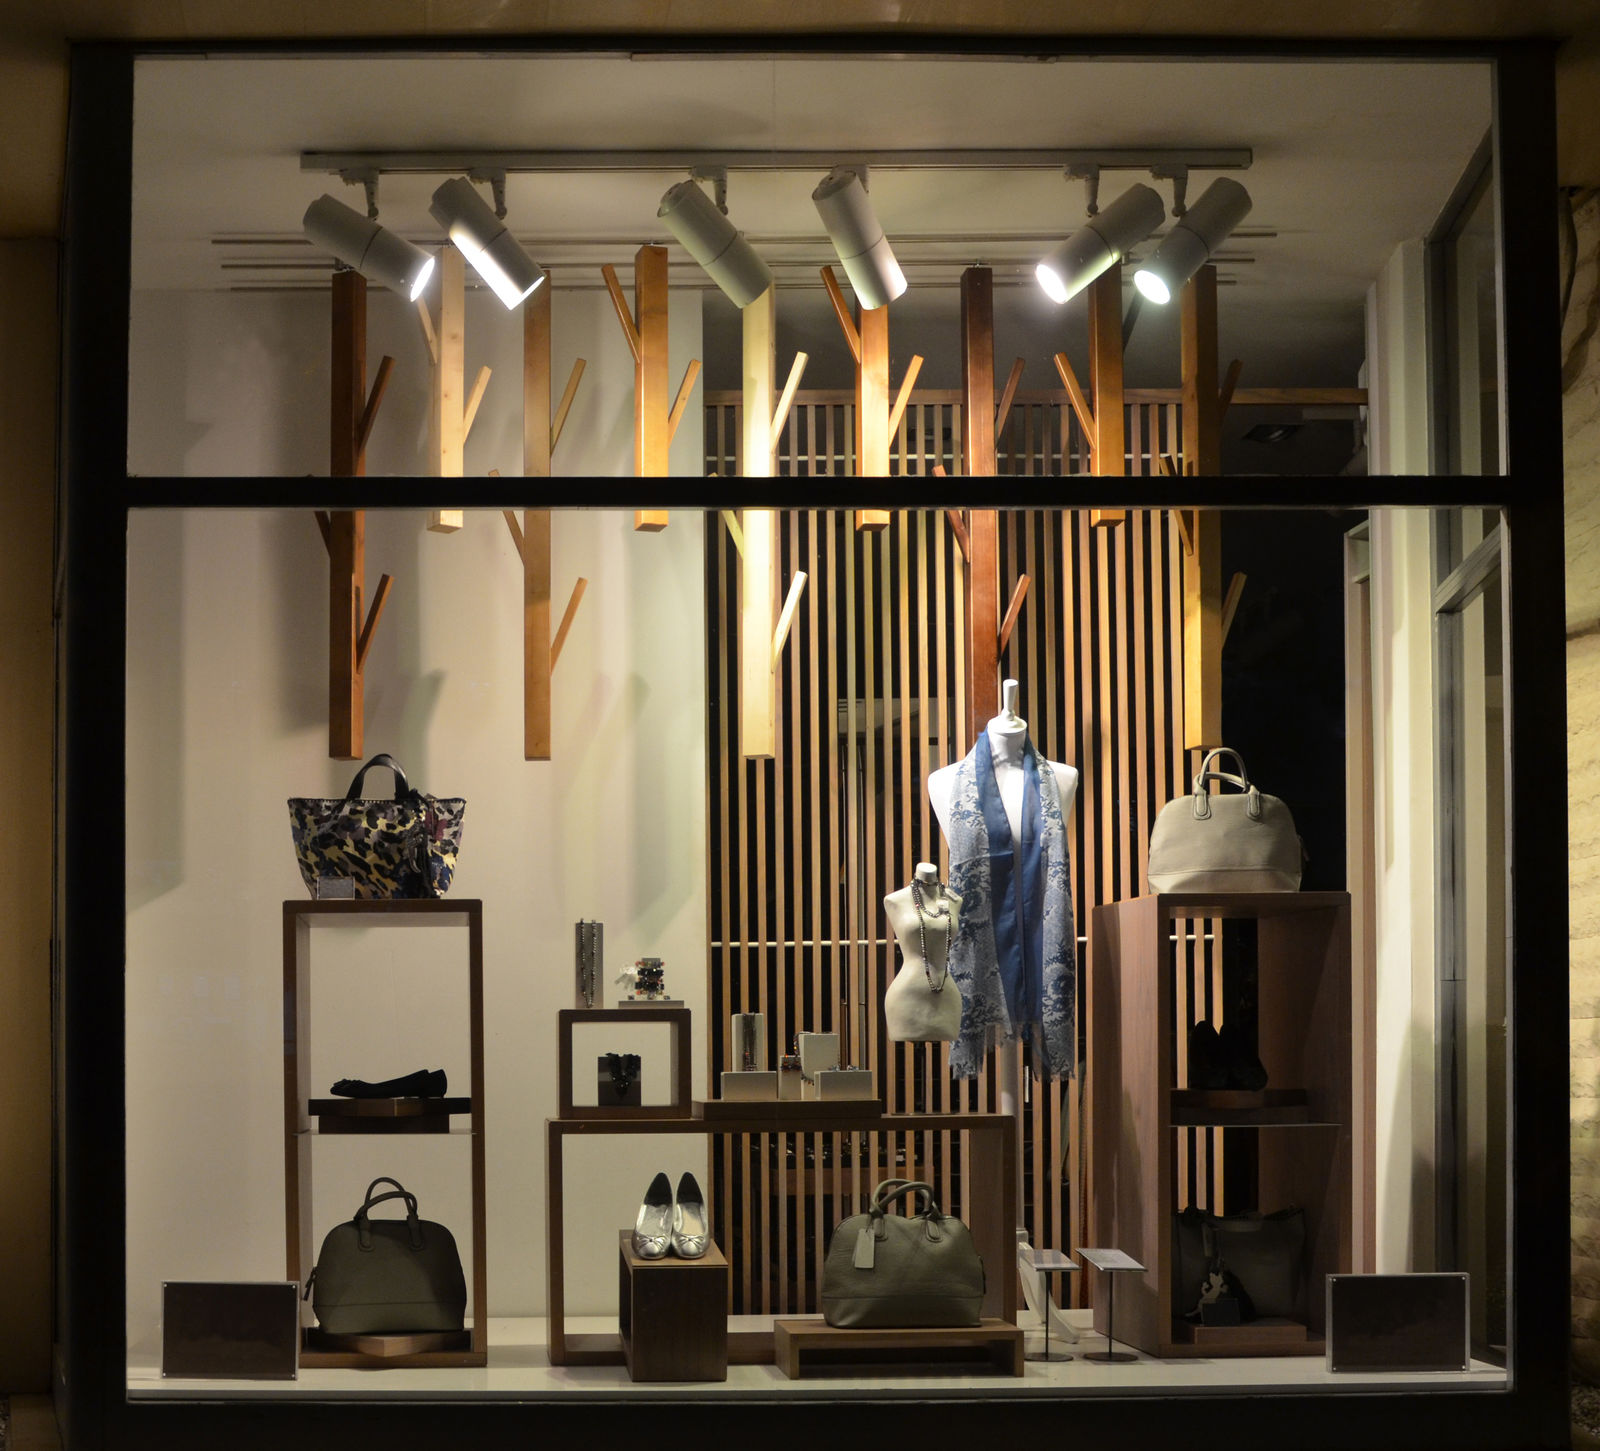 Sample Shop in Berlin (Bild 2)